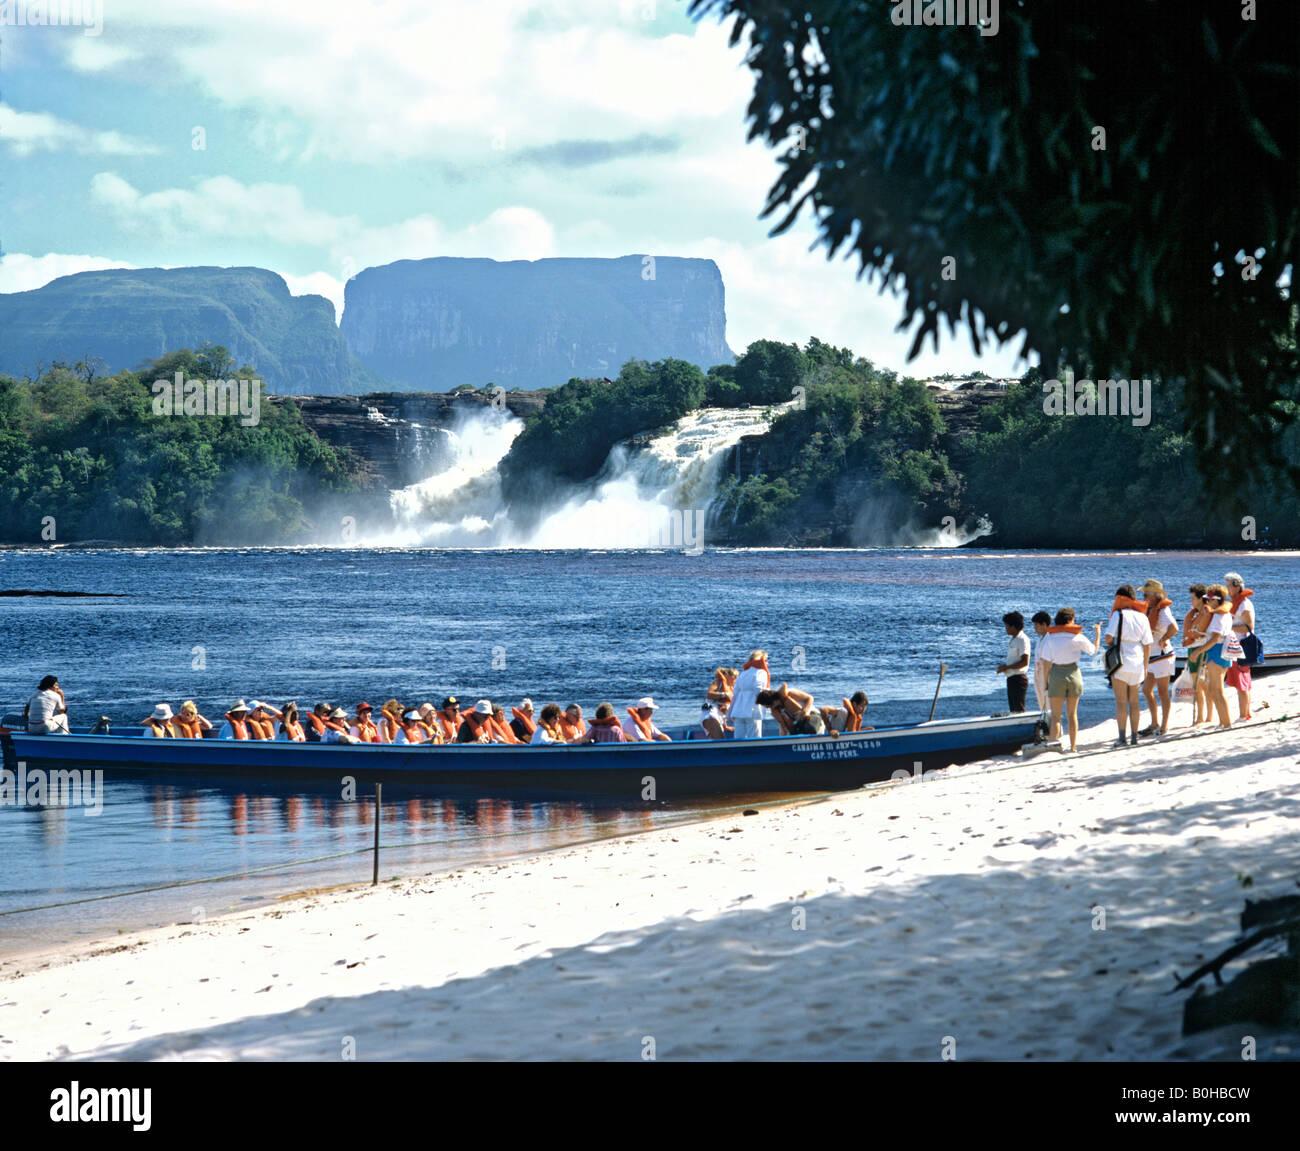 Canaima Lagoon, boat, waterfalls, Canaima, Kamarakotos, Venezuela, South America - Stock Image